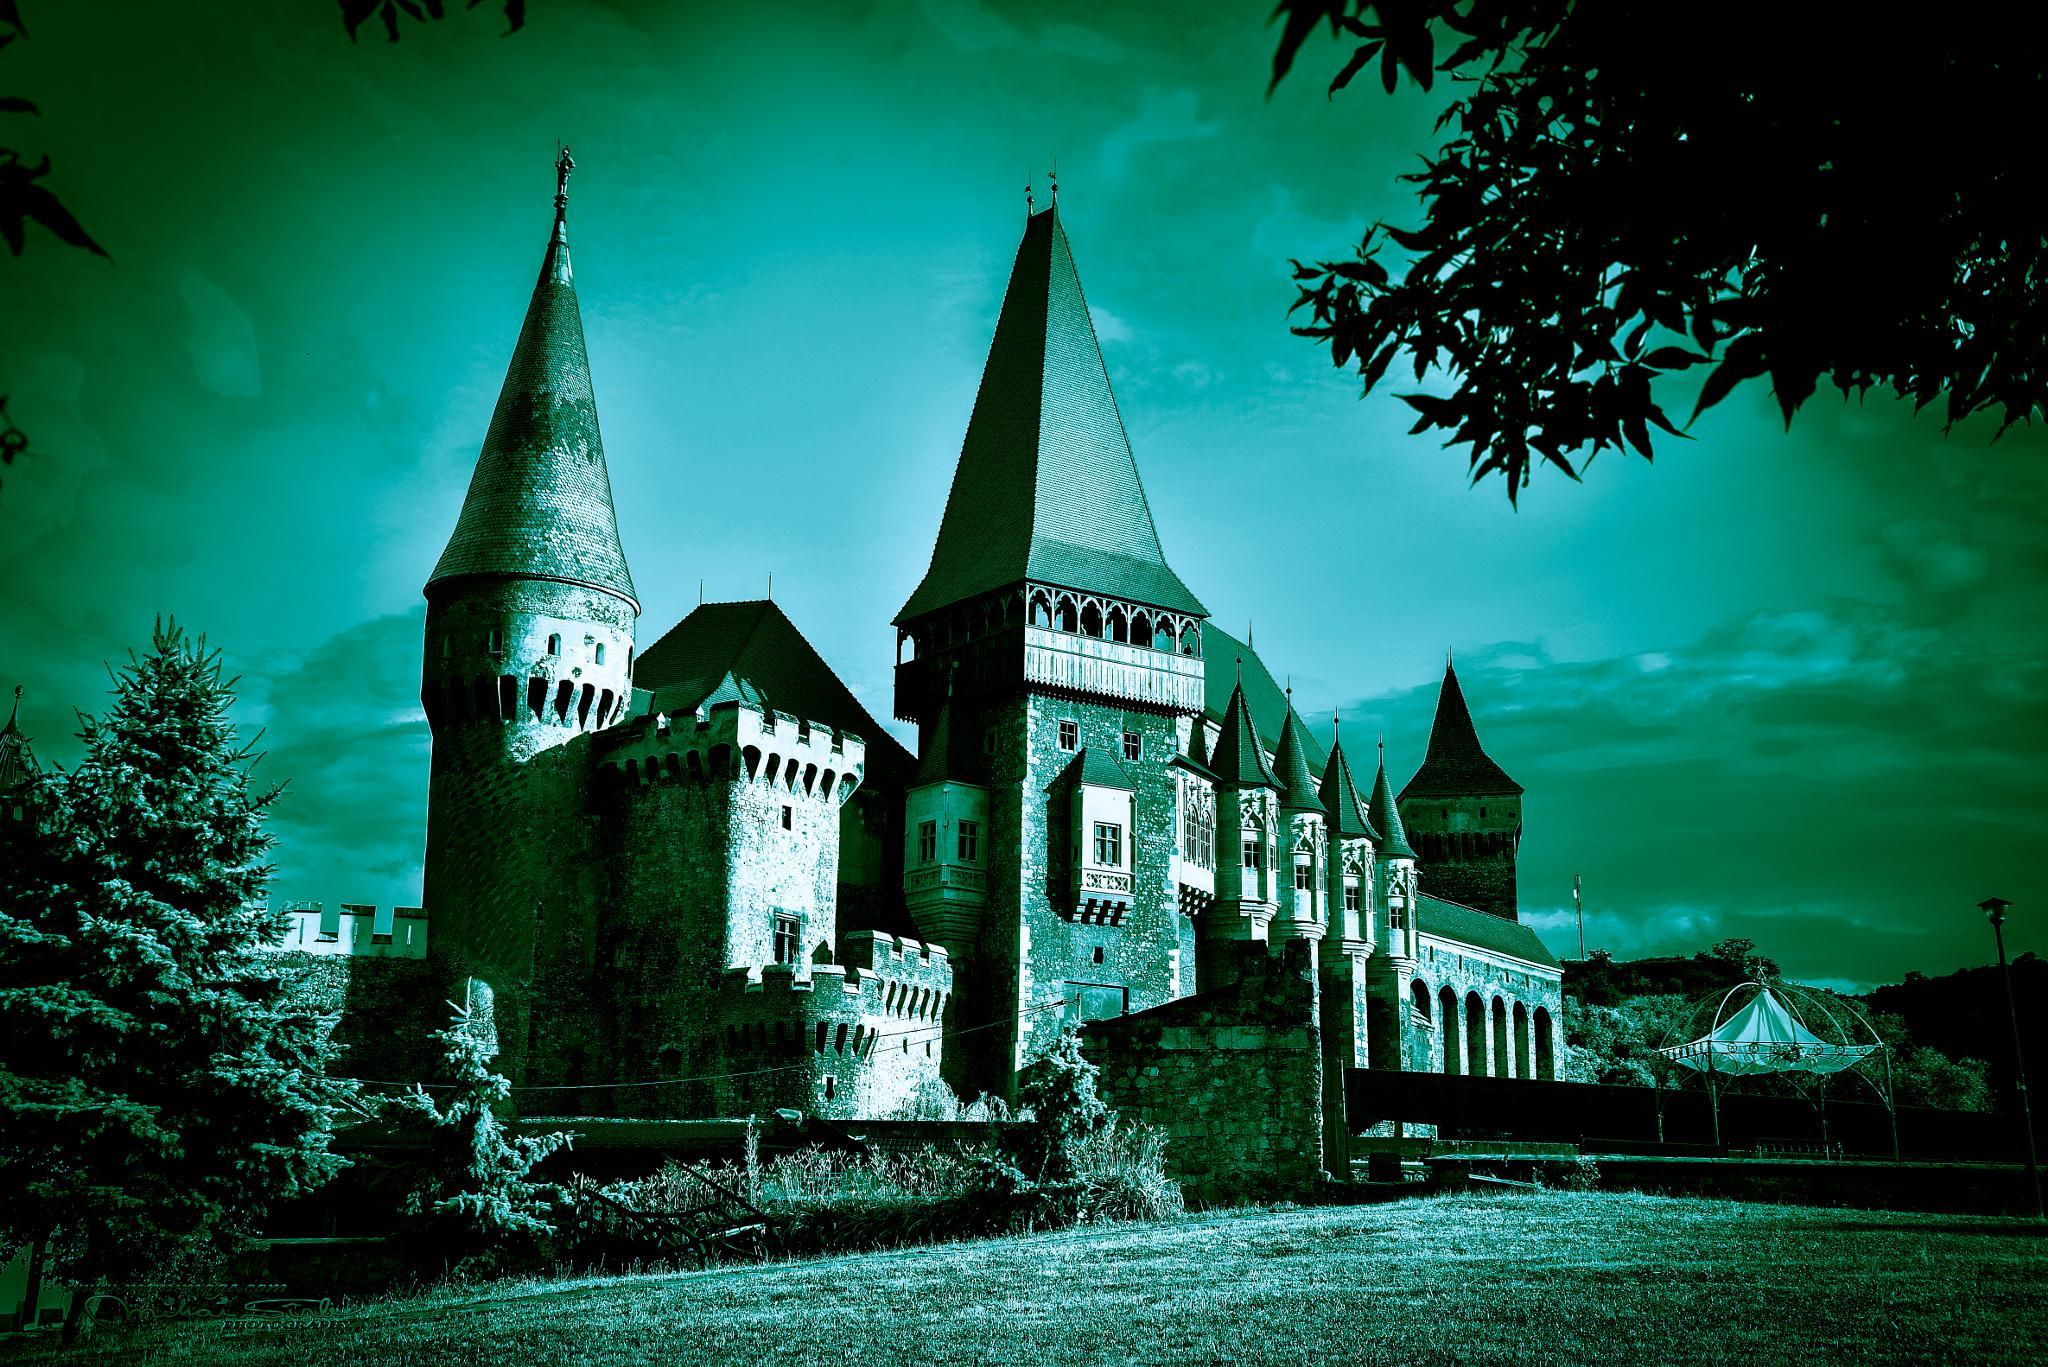 Castele Hunedoara by Mihai Sirb